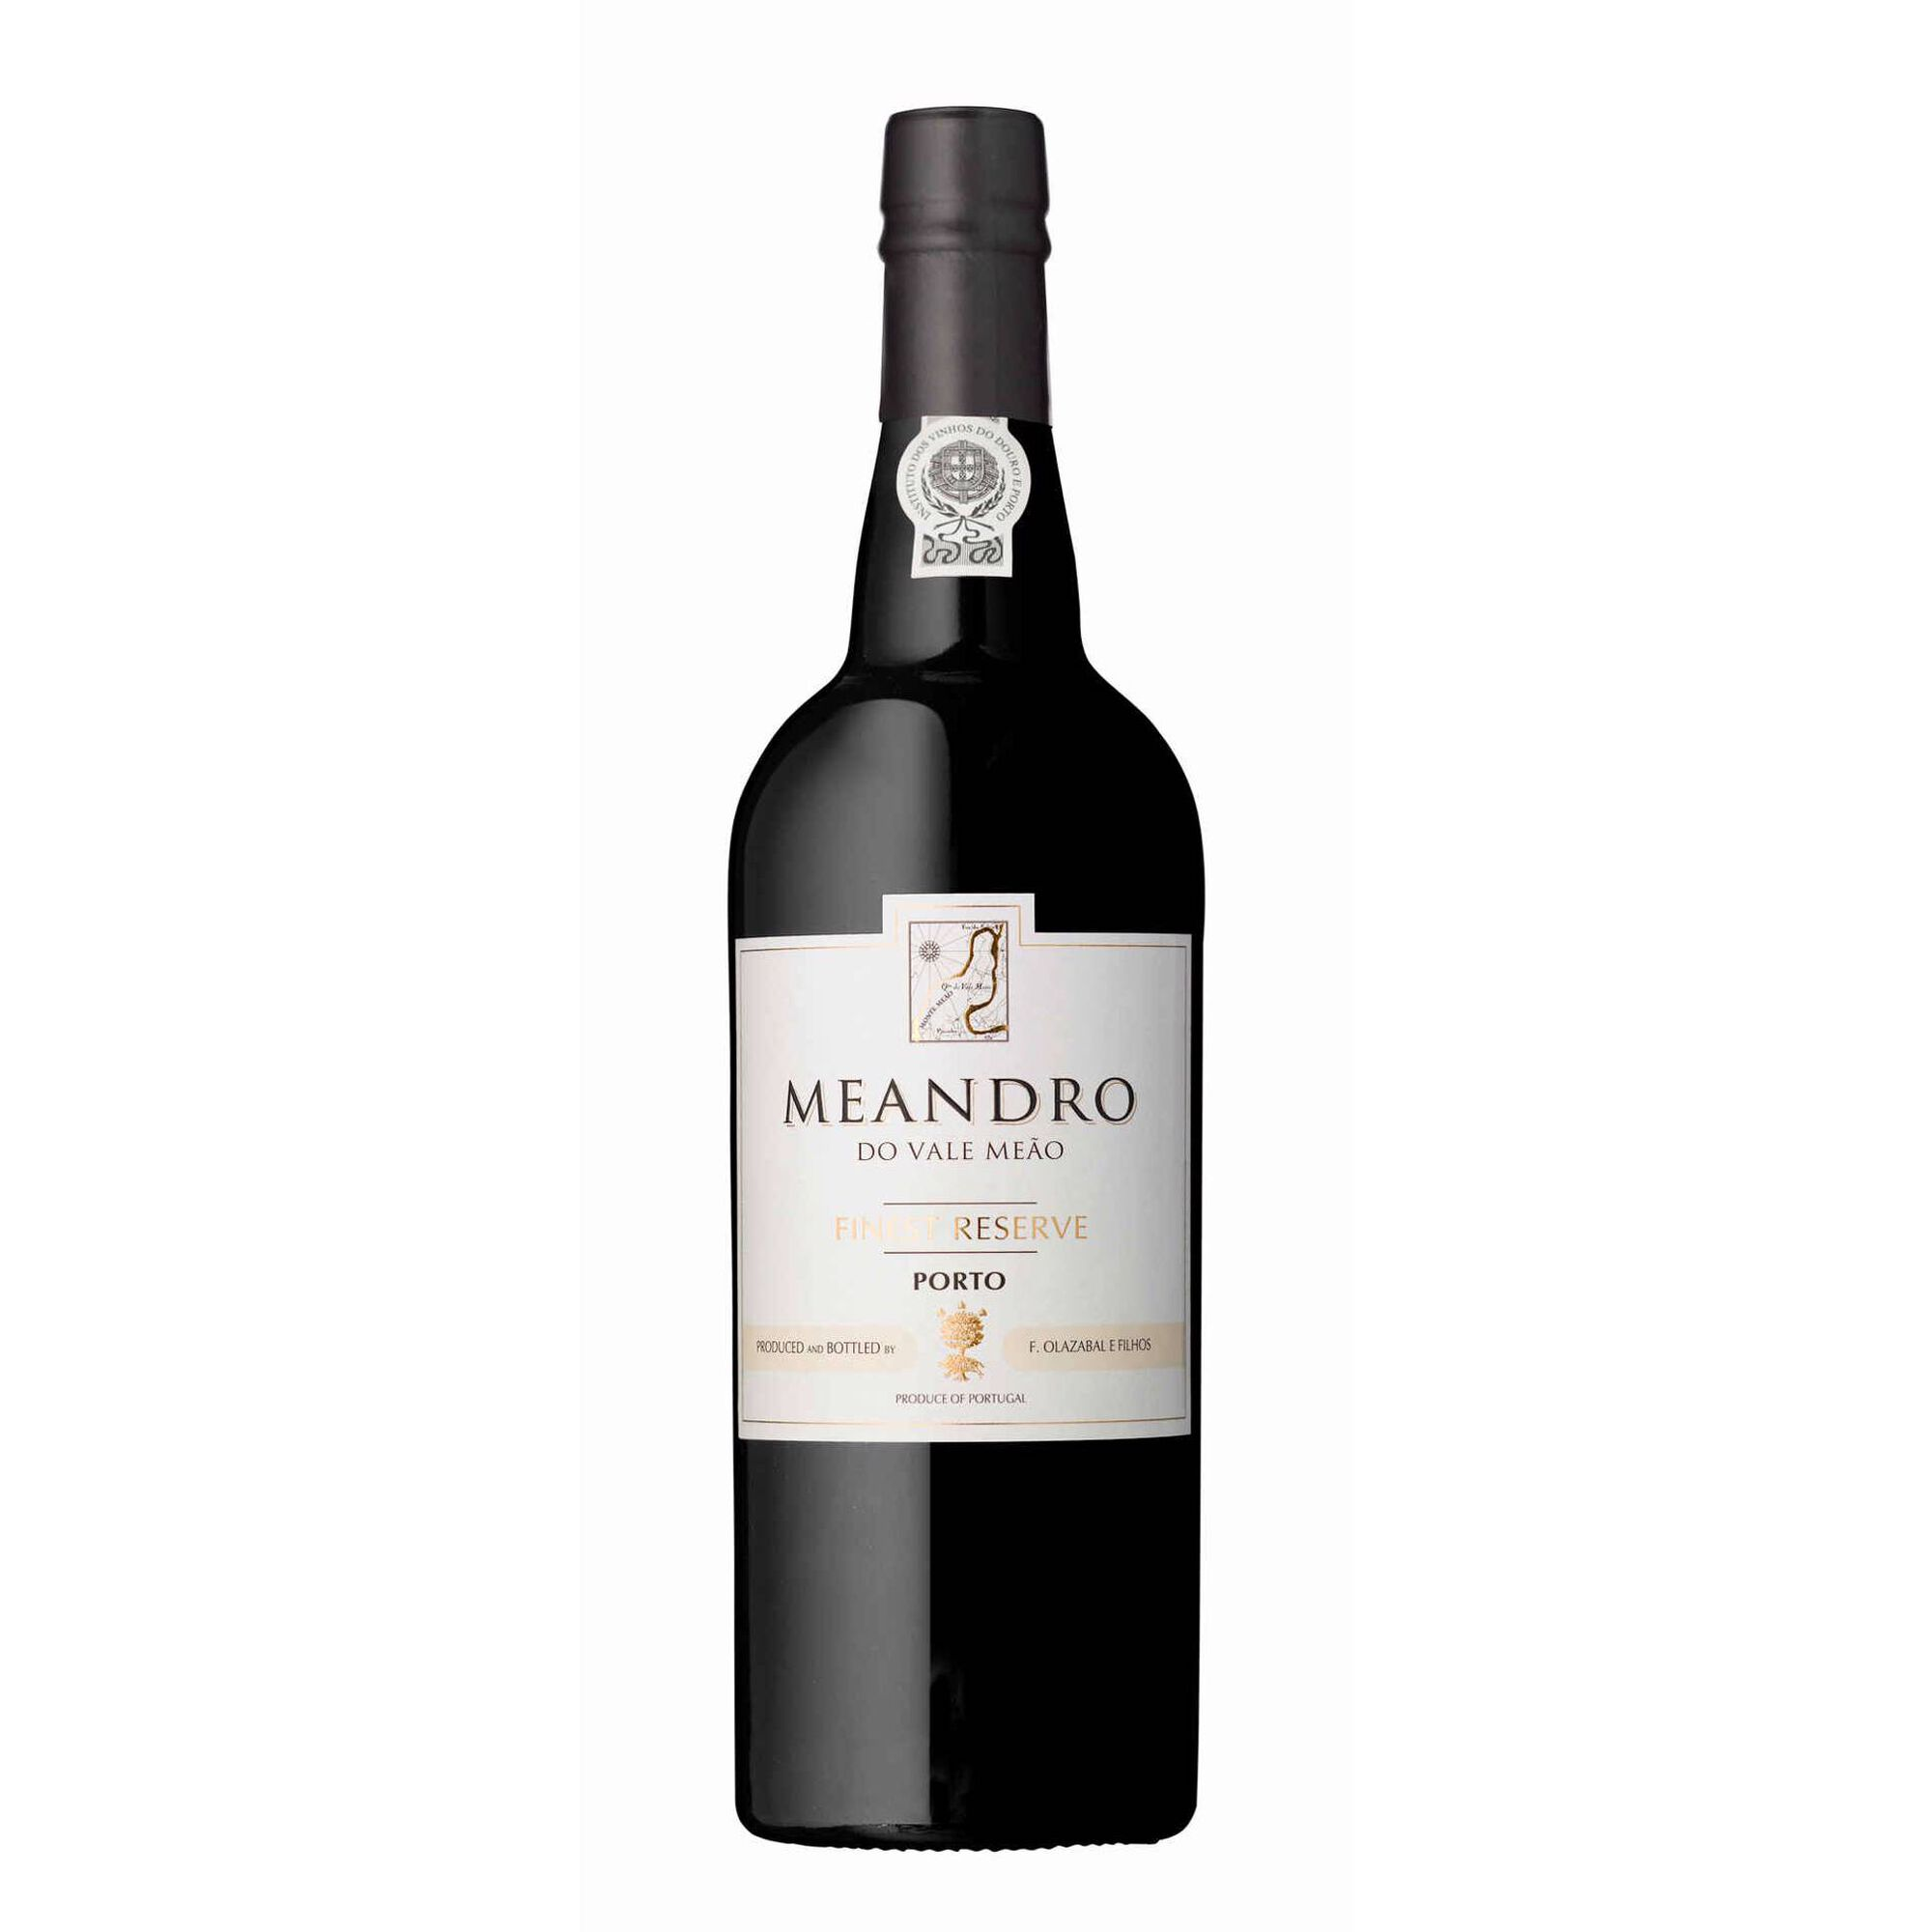 Meandro Vinho do Porto Ruby Finest Reserve